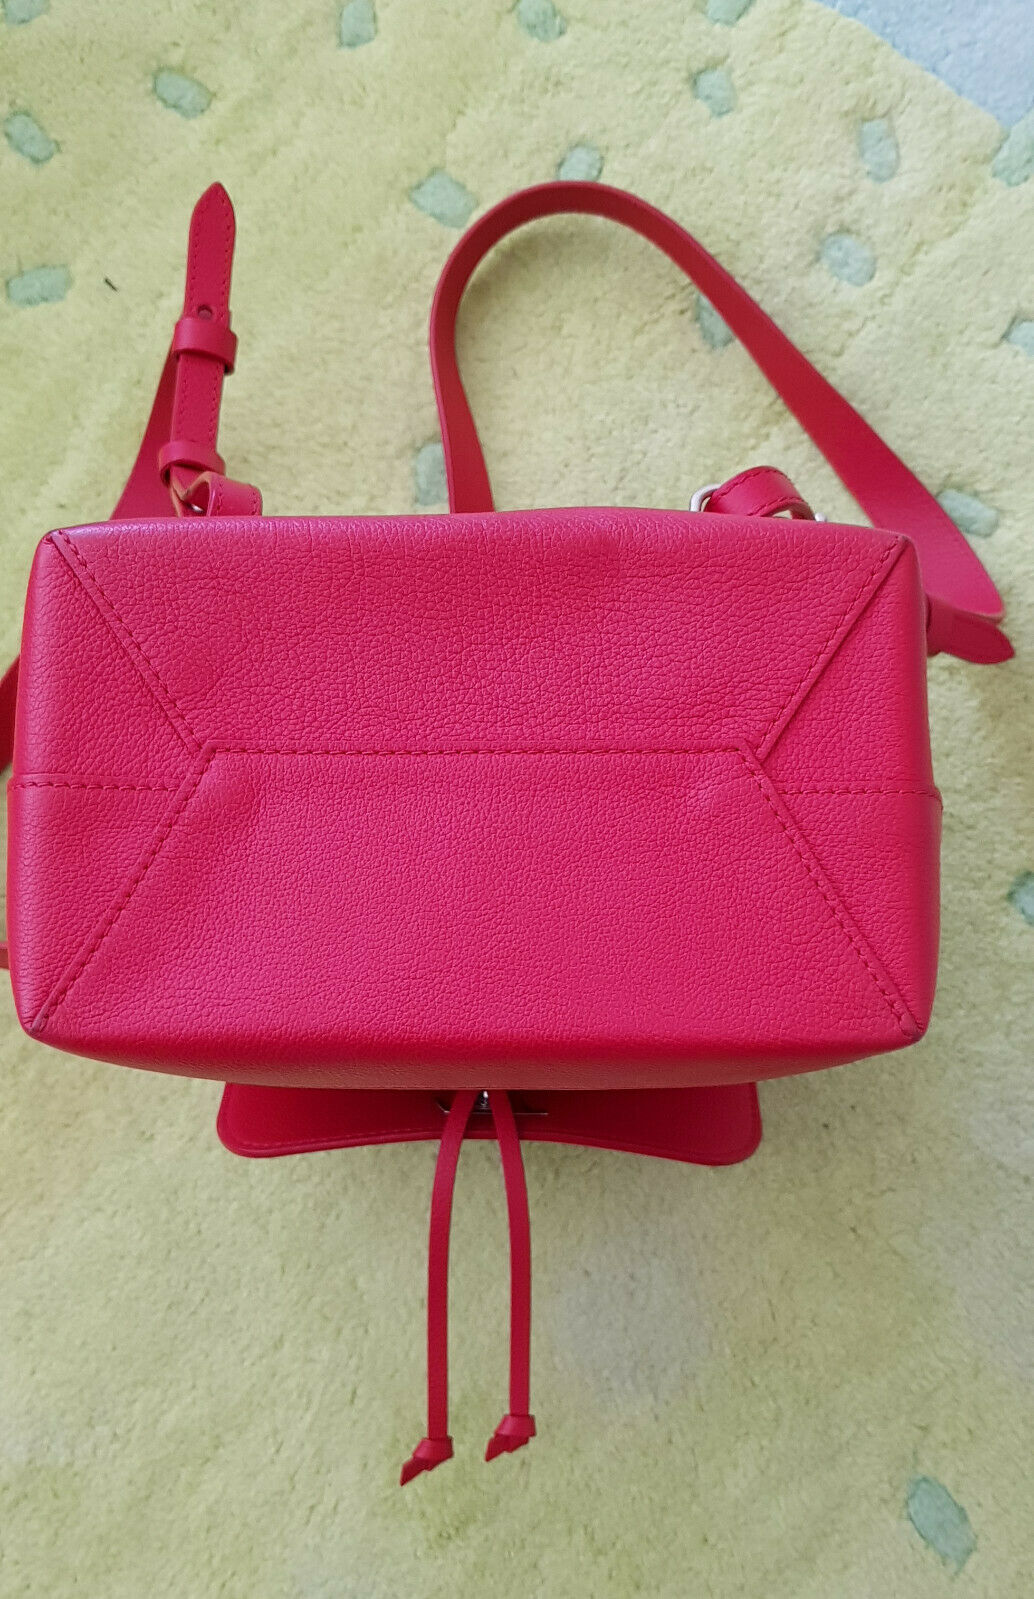 Louis Vuitton Lockme Backpack - image 12